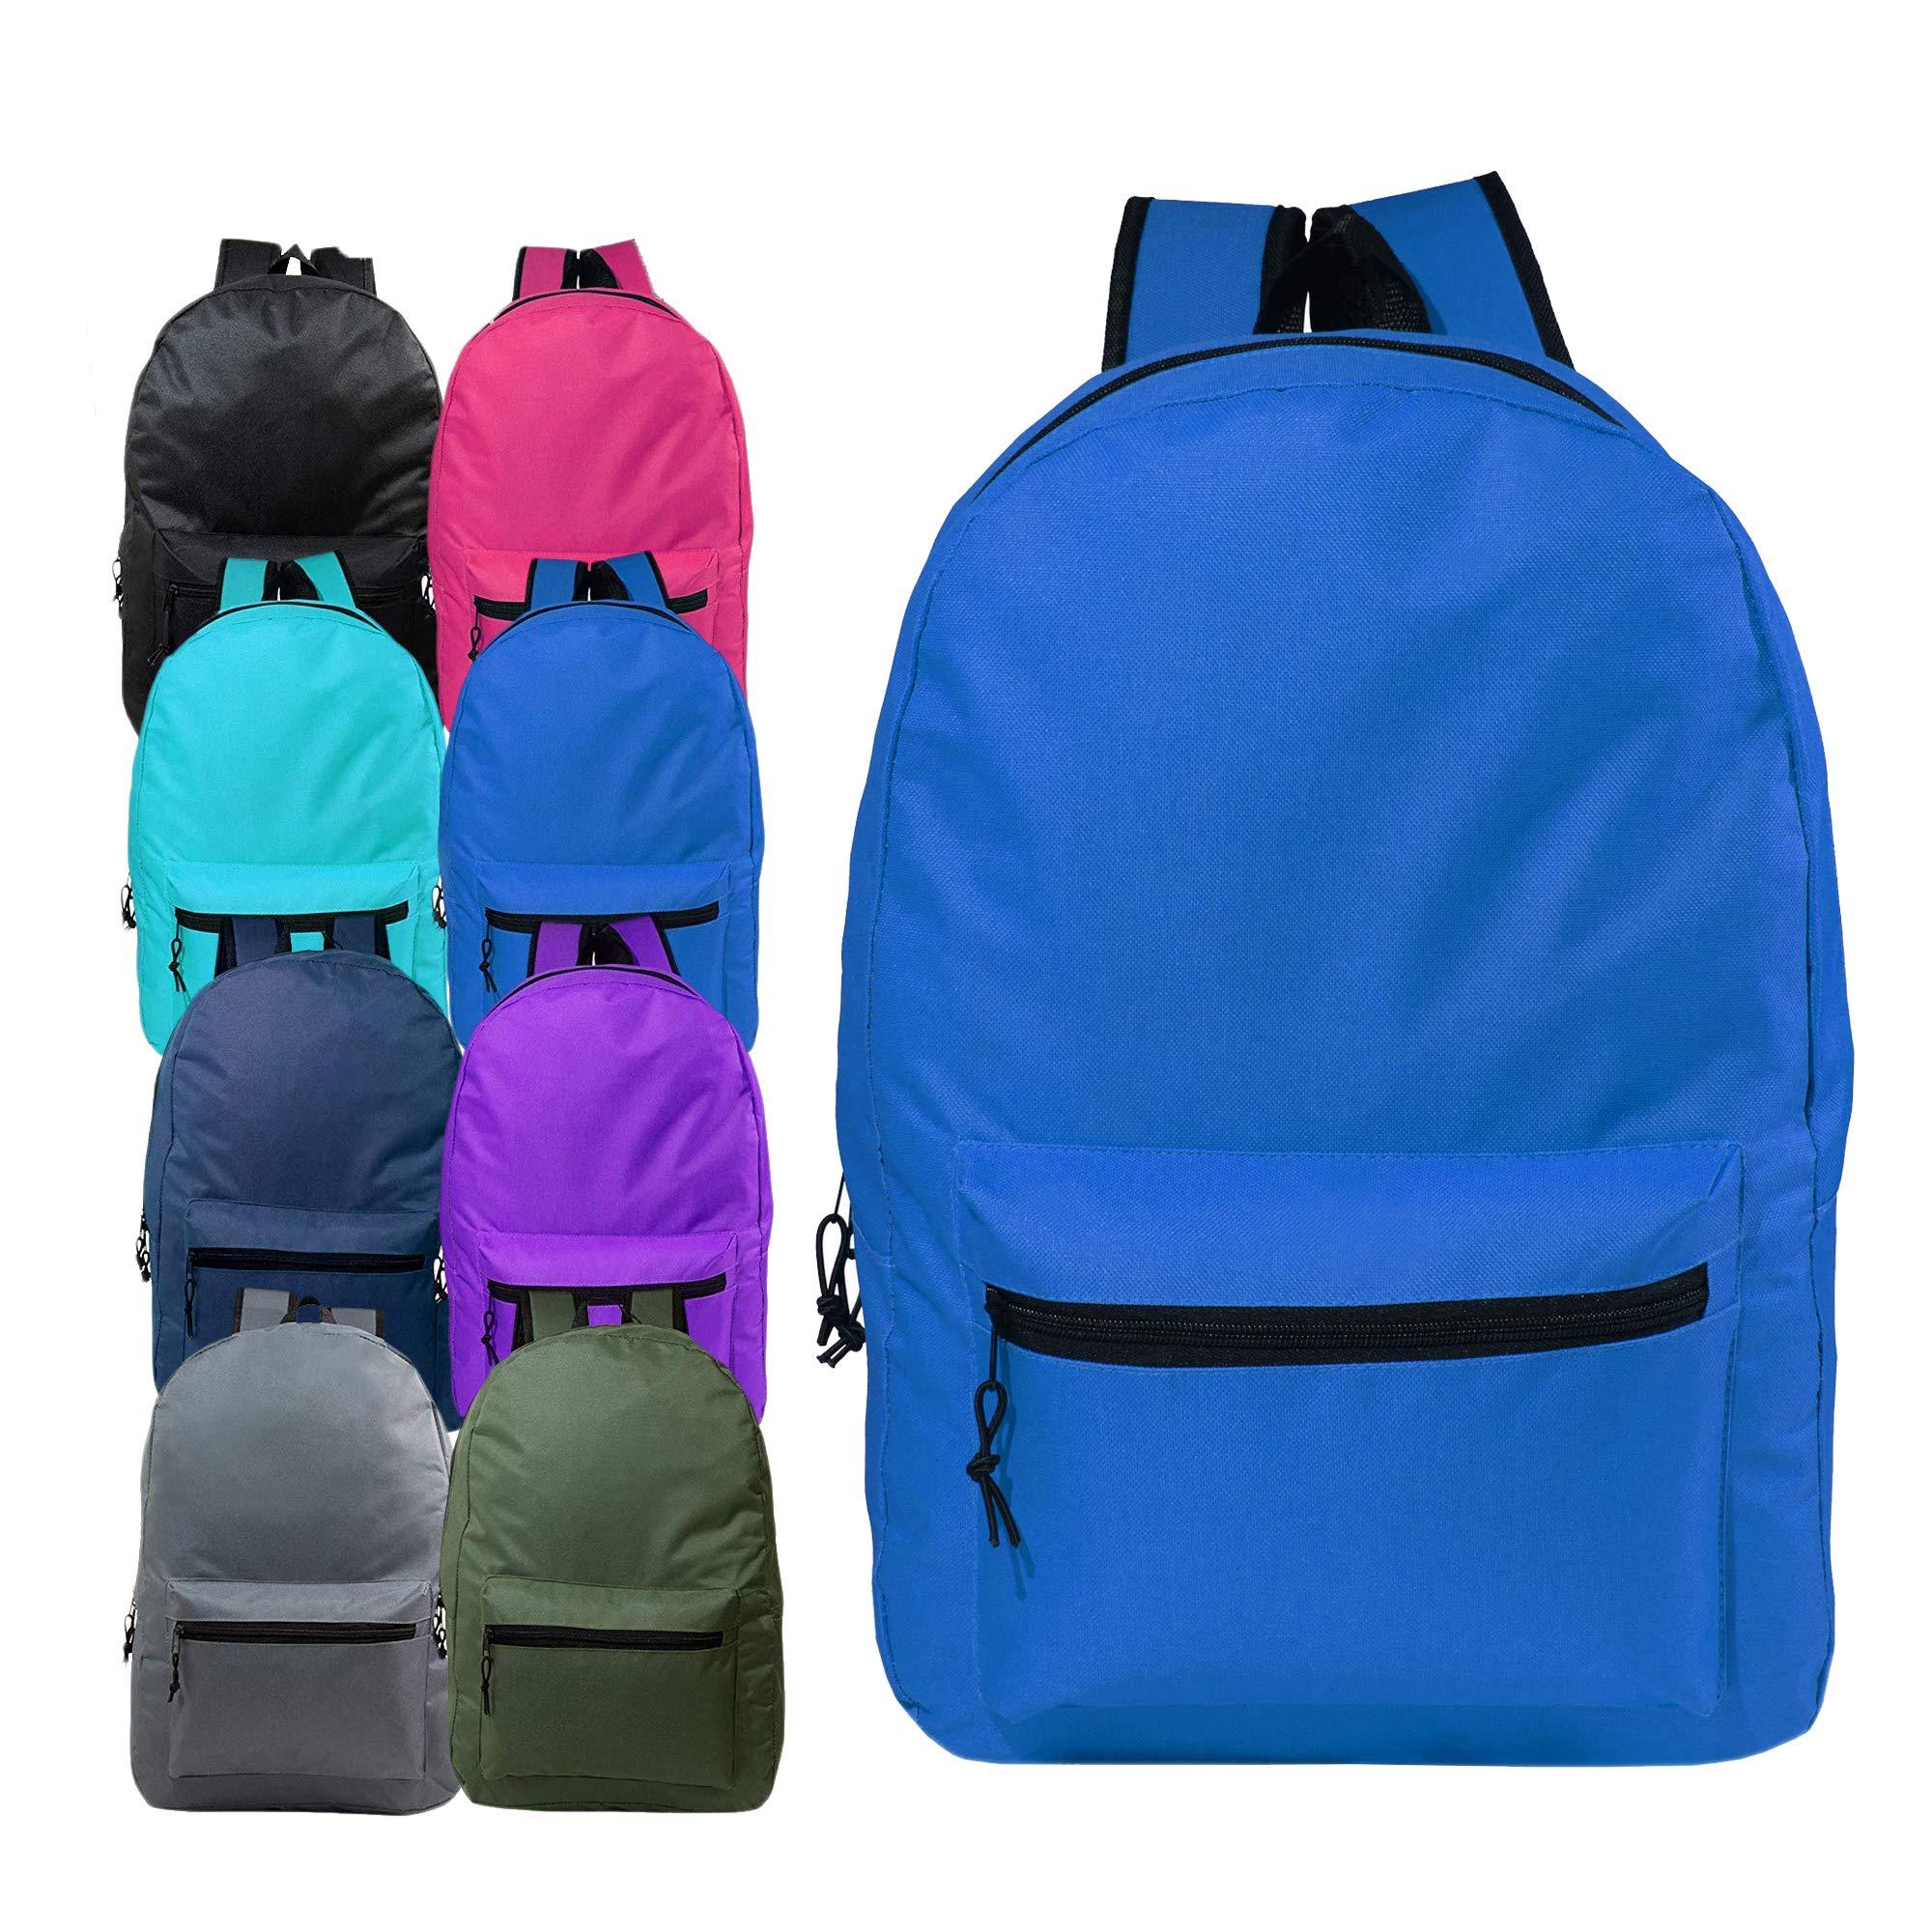 17'' Wholesale Kids Basic Backpack in 8 Assorted Colors - Bulk Case of 24 Bookbags